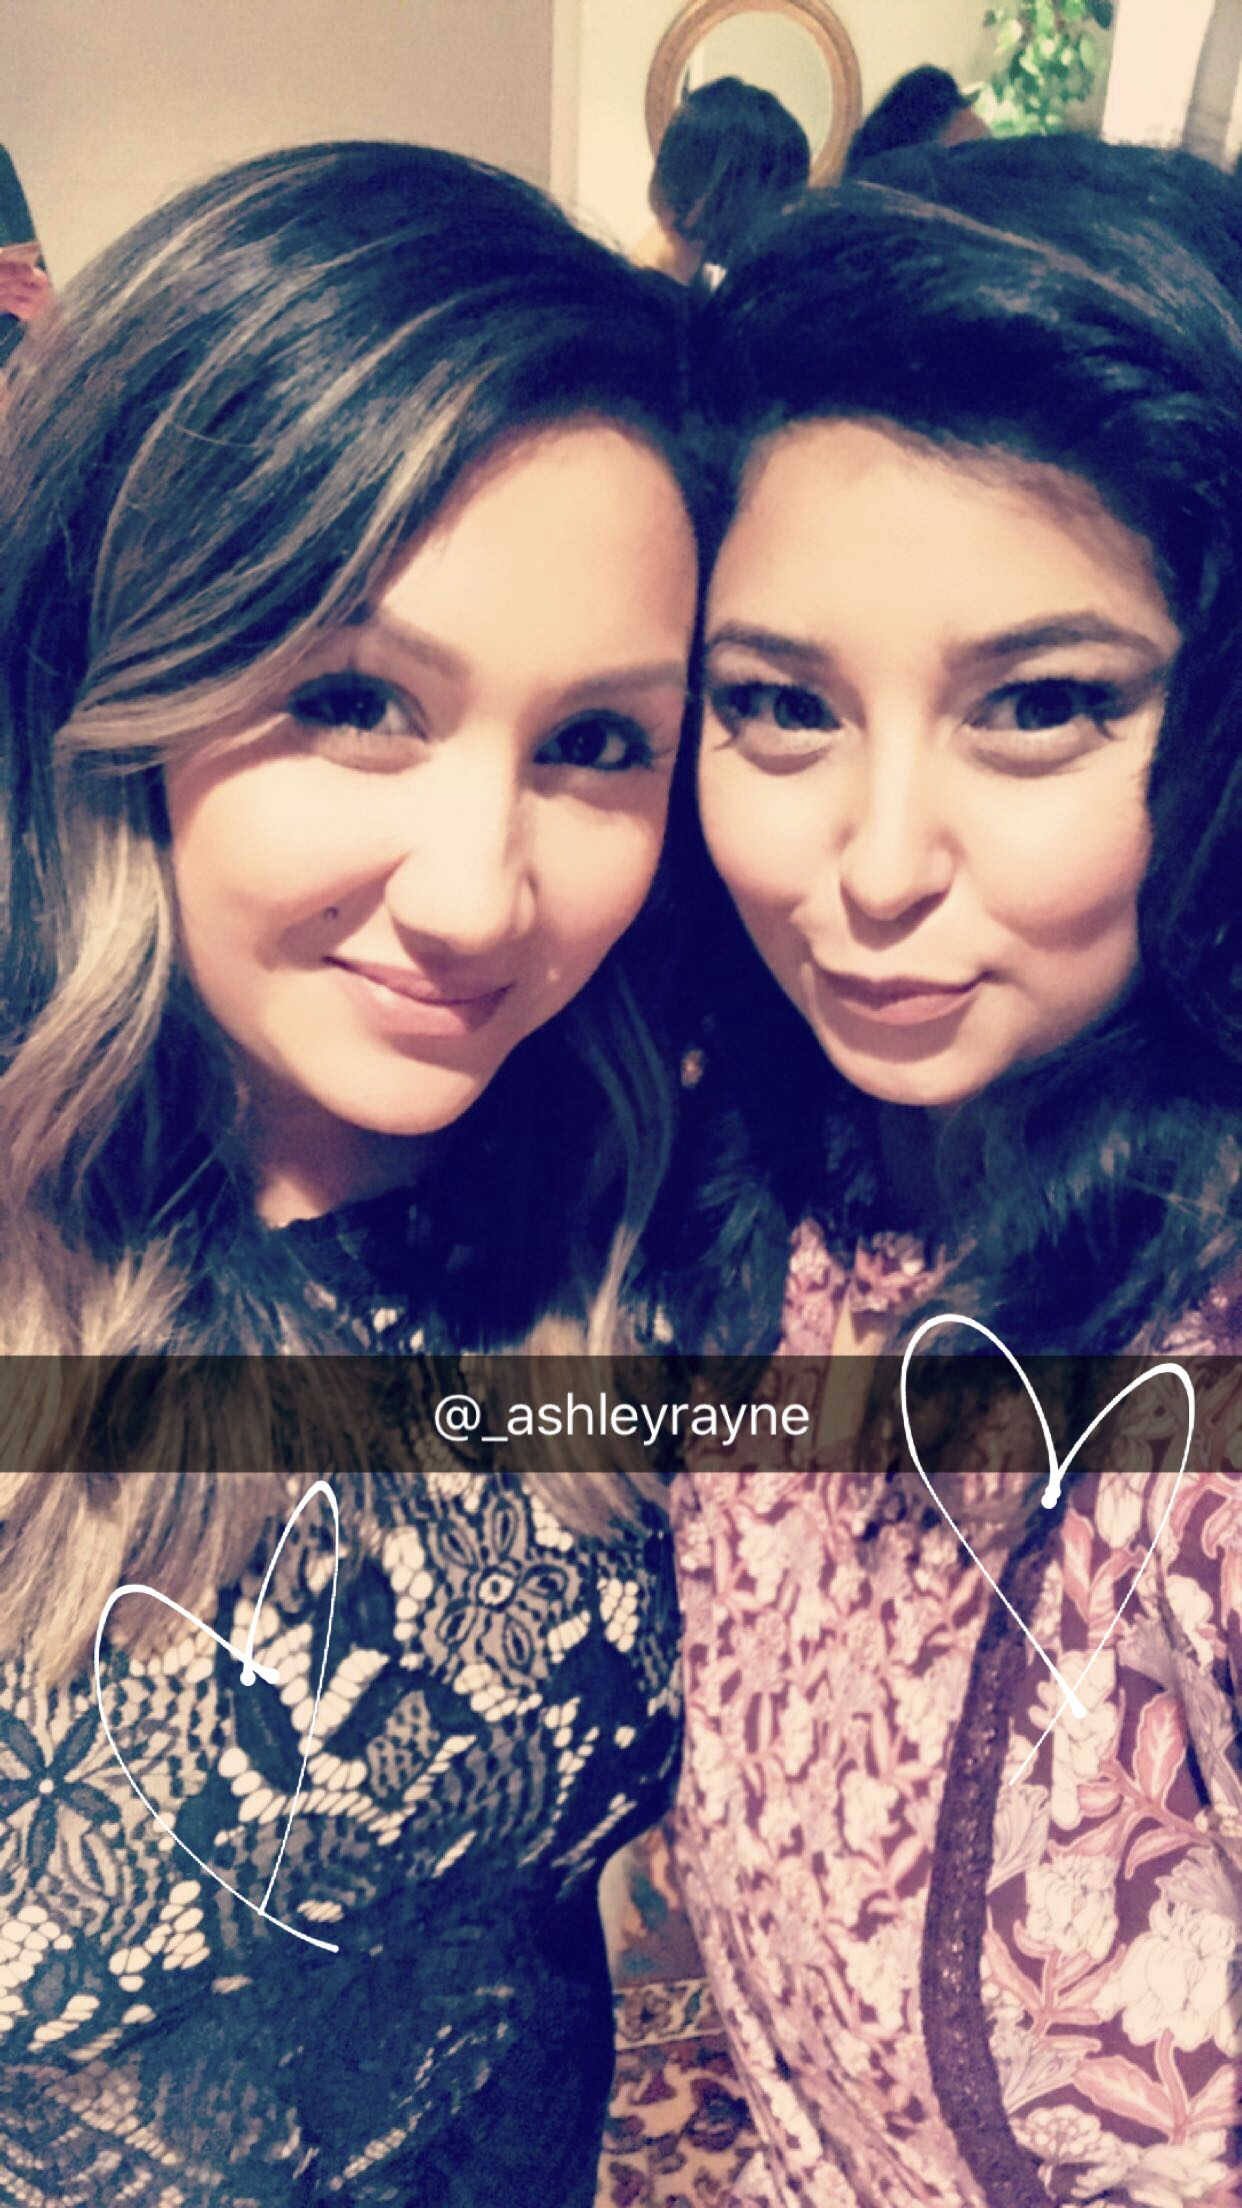 @_ashleyrayne